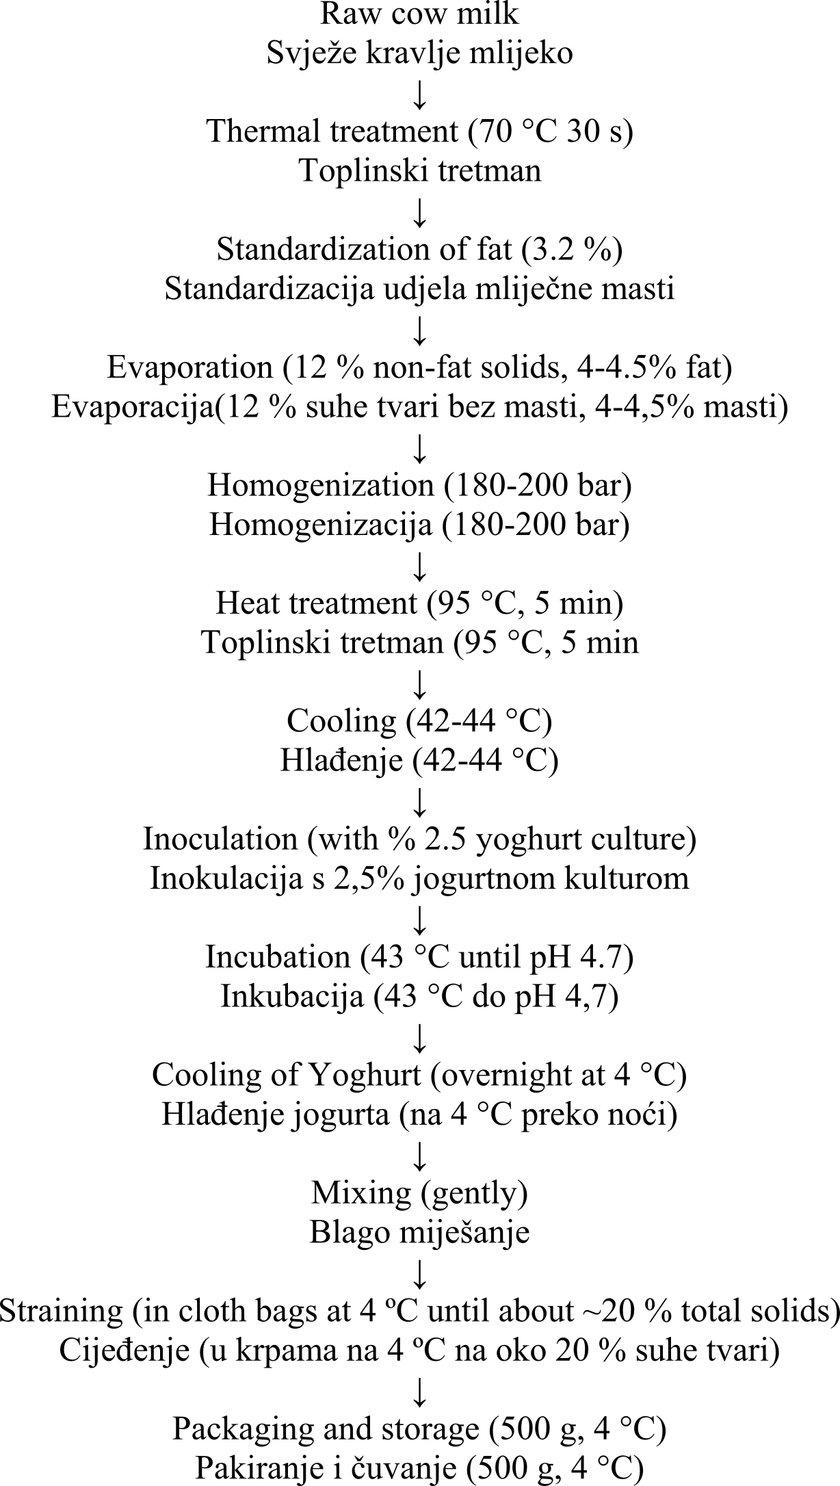 hight resolution of flow diagram of torba yoghurt production grafikon 1 dijagram proizvodnje torba jogurta